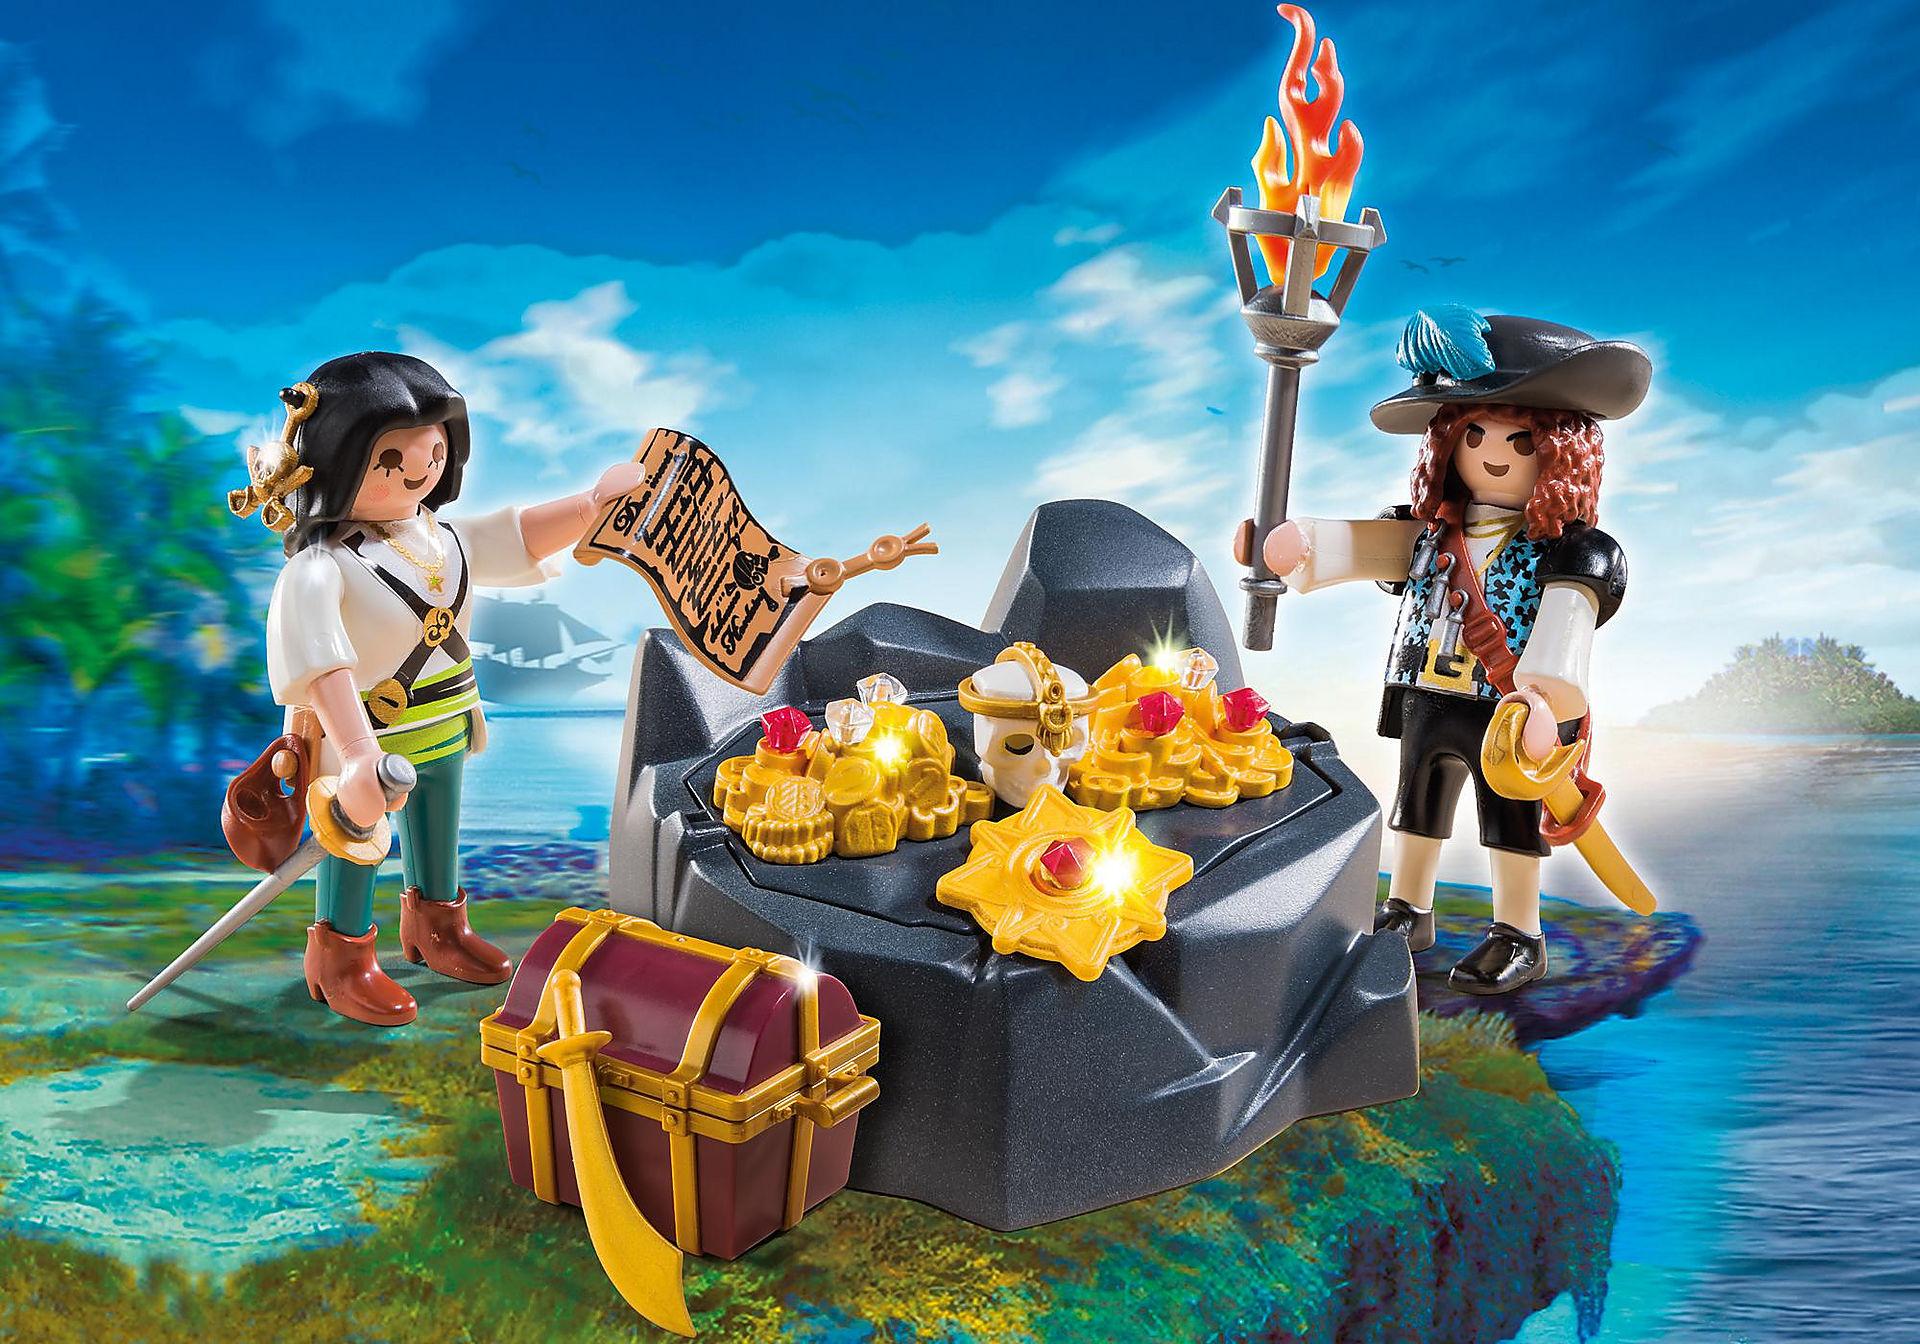 6683 Pirate Treasure Hideout zoom image1